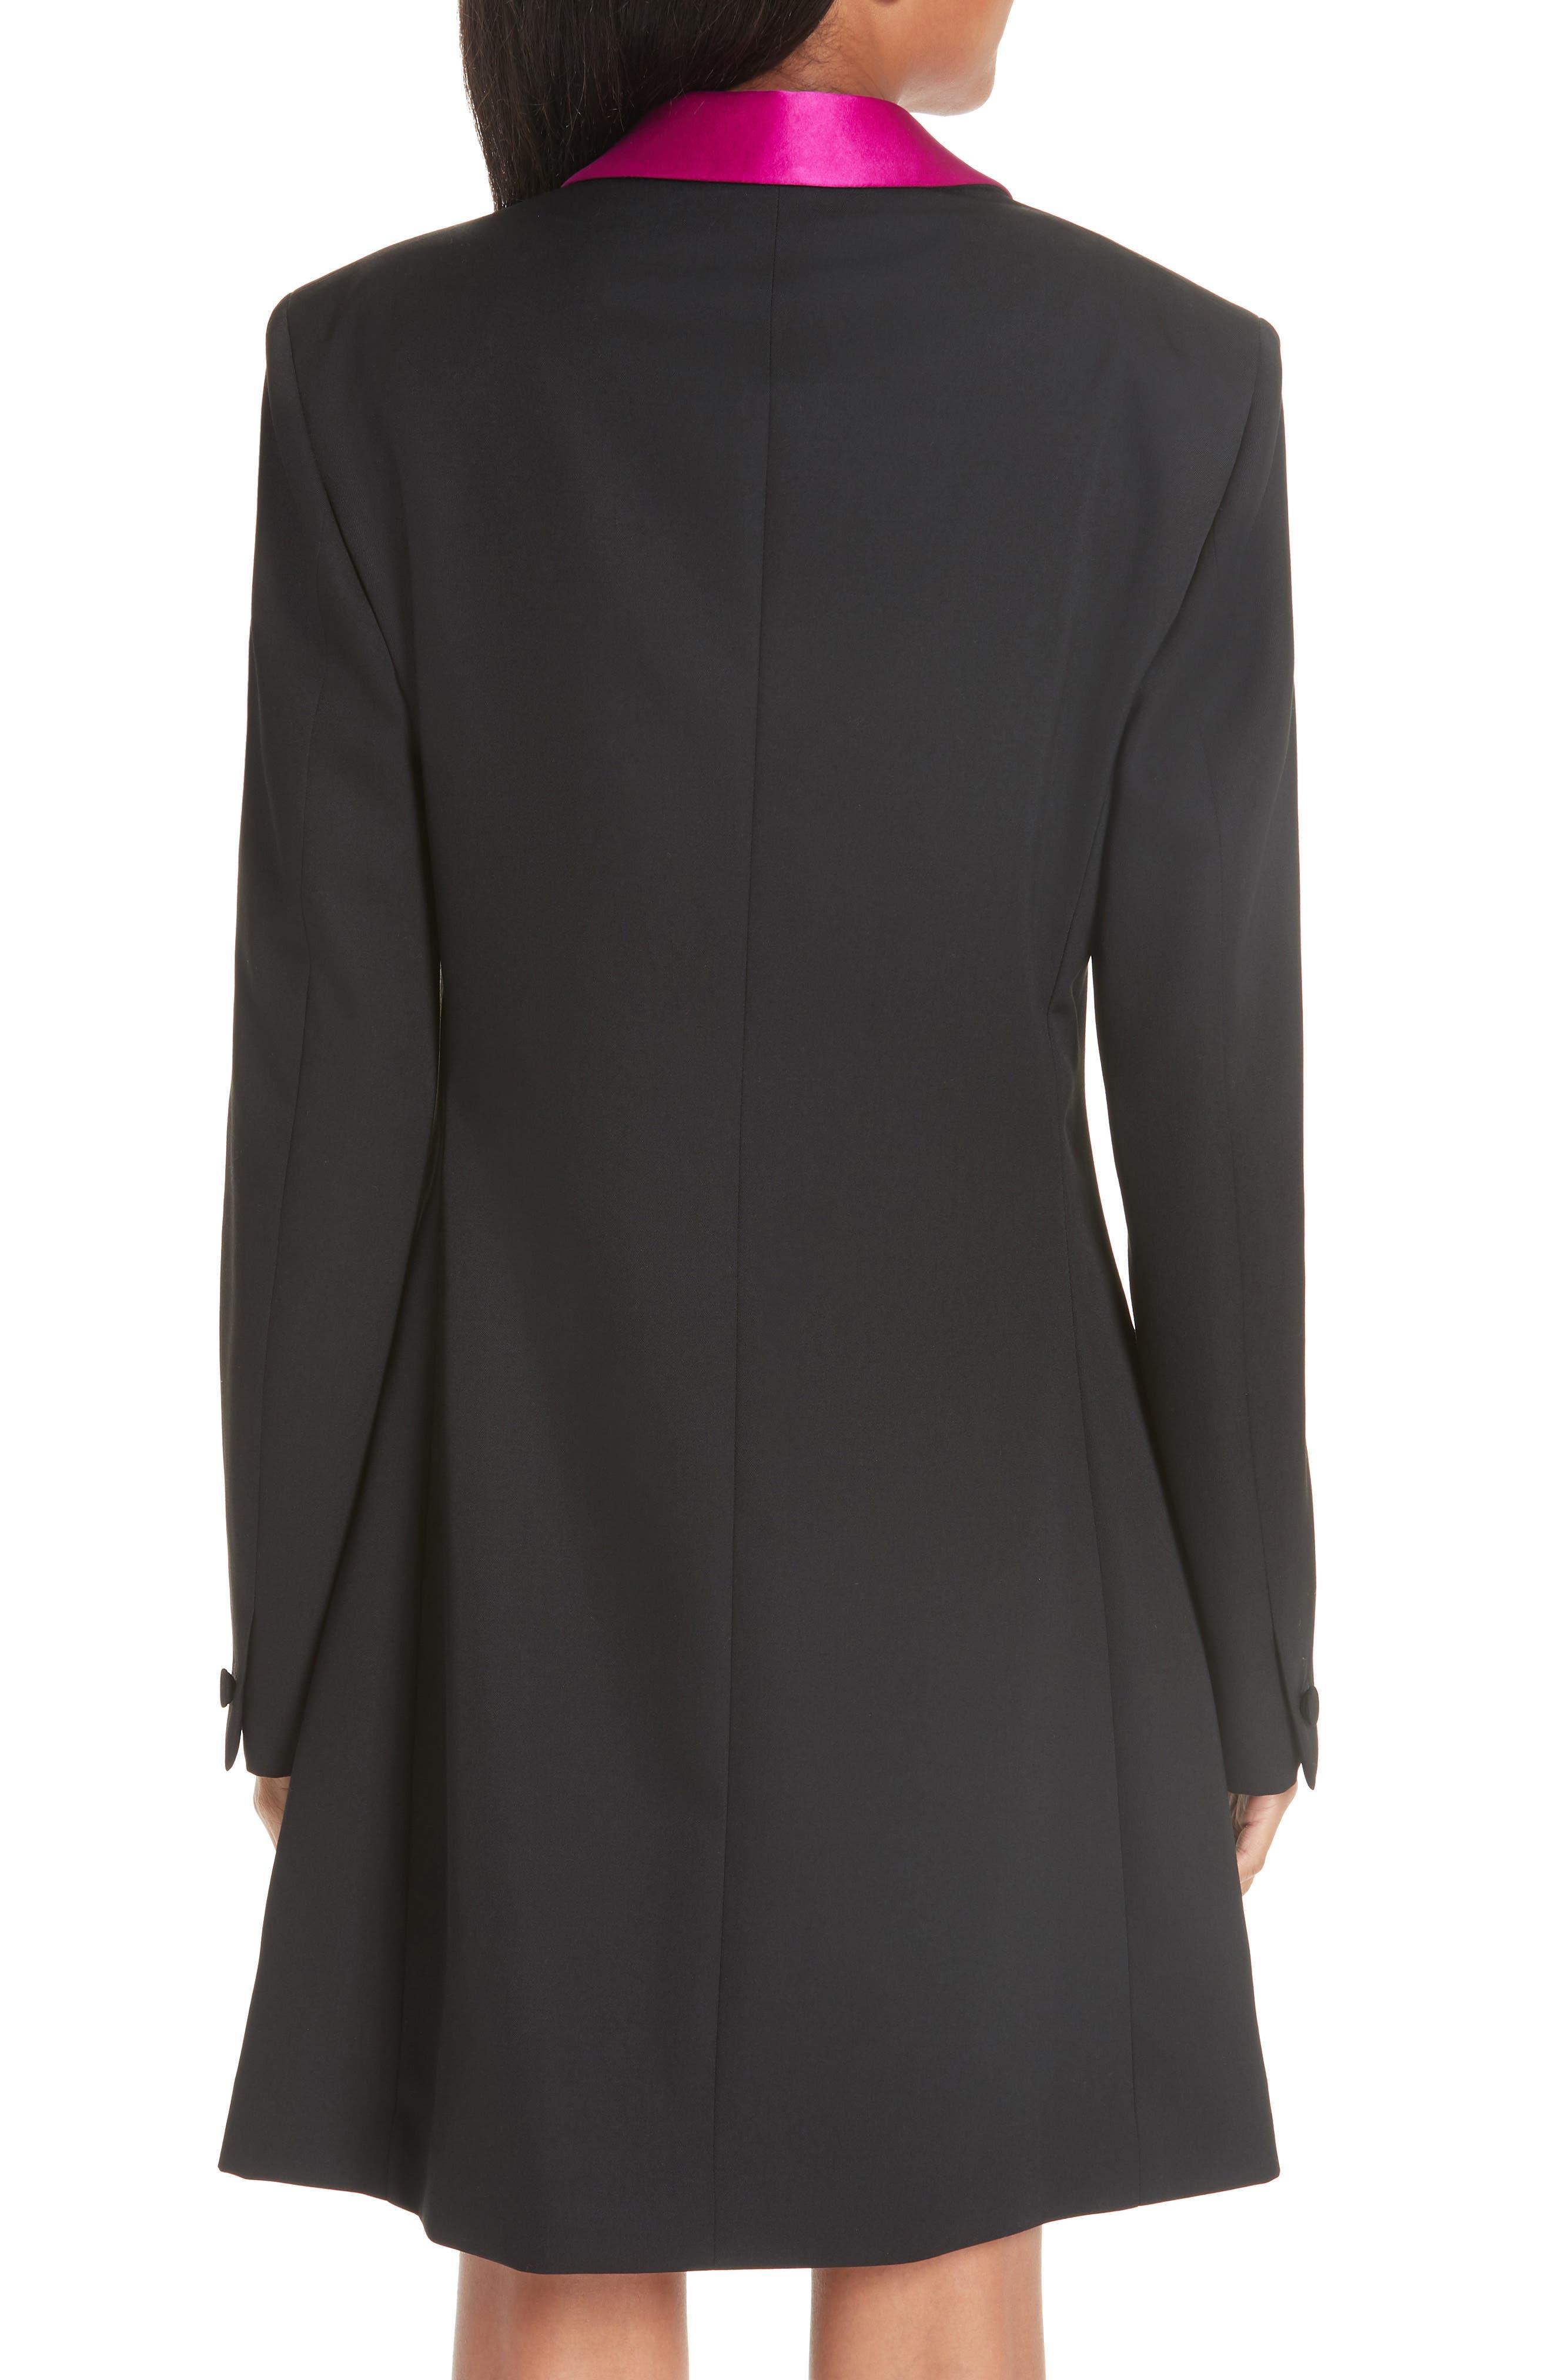 CALVIN KLEIN 205W39NYC, Contrast Lapel Wool Gabardine Jacket, Alternate thumbnail 2, color, BLACK DARK ORCHID